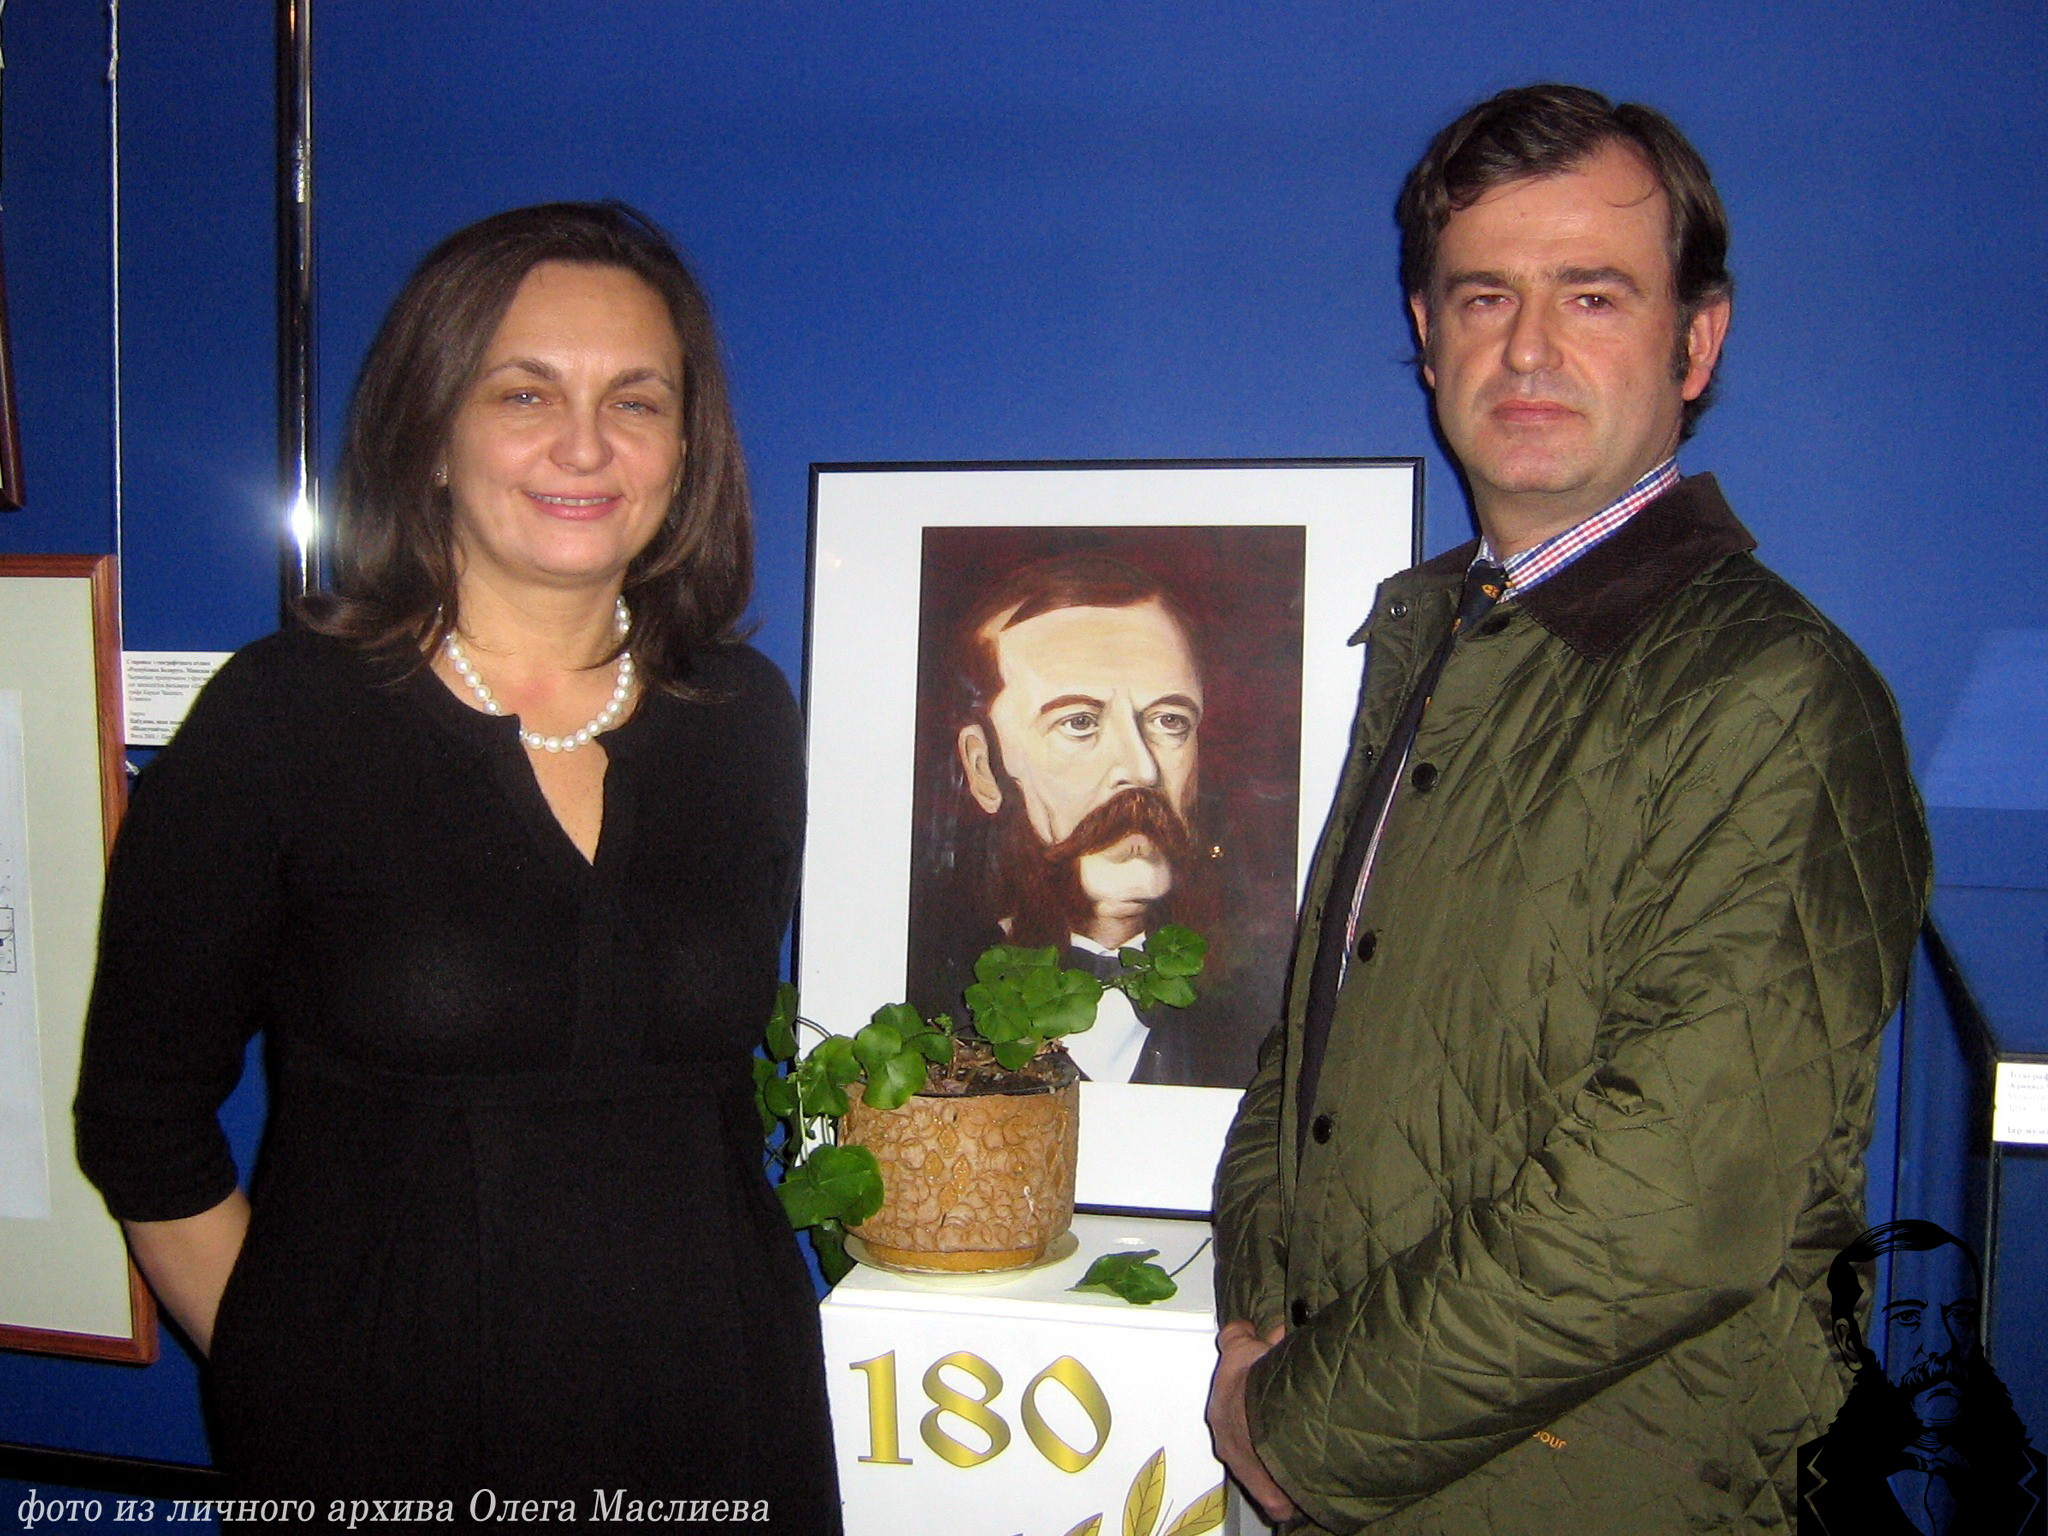 Эдуард-Аранд Годлевский и его жена Александра Ванькович де Арандо. Минск, 2009 г.